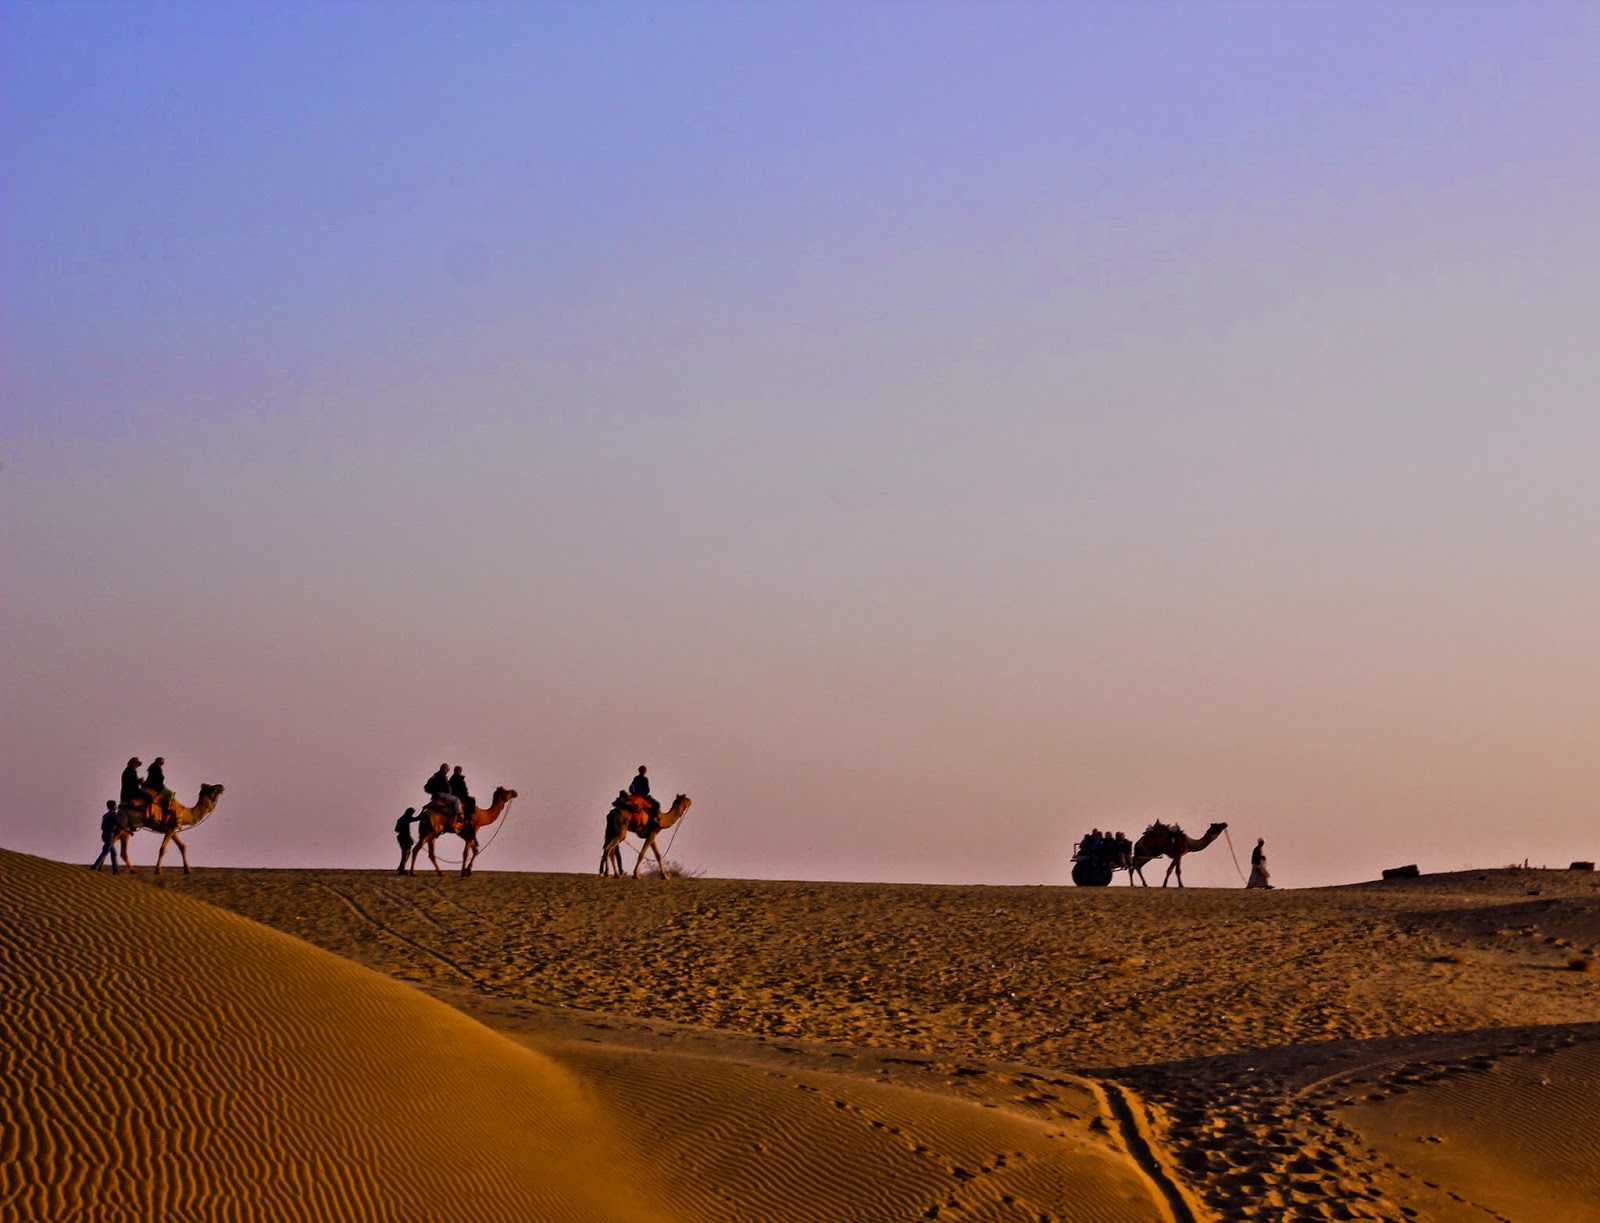 View of camel safari at the Sam Sand Dunes, Jaisalmer